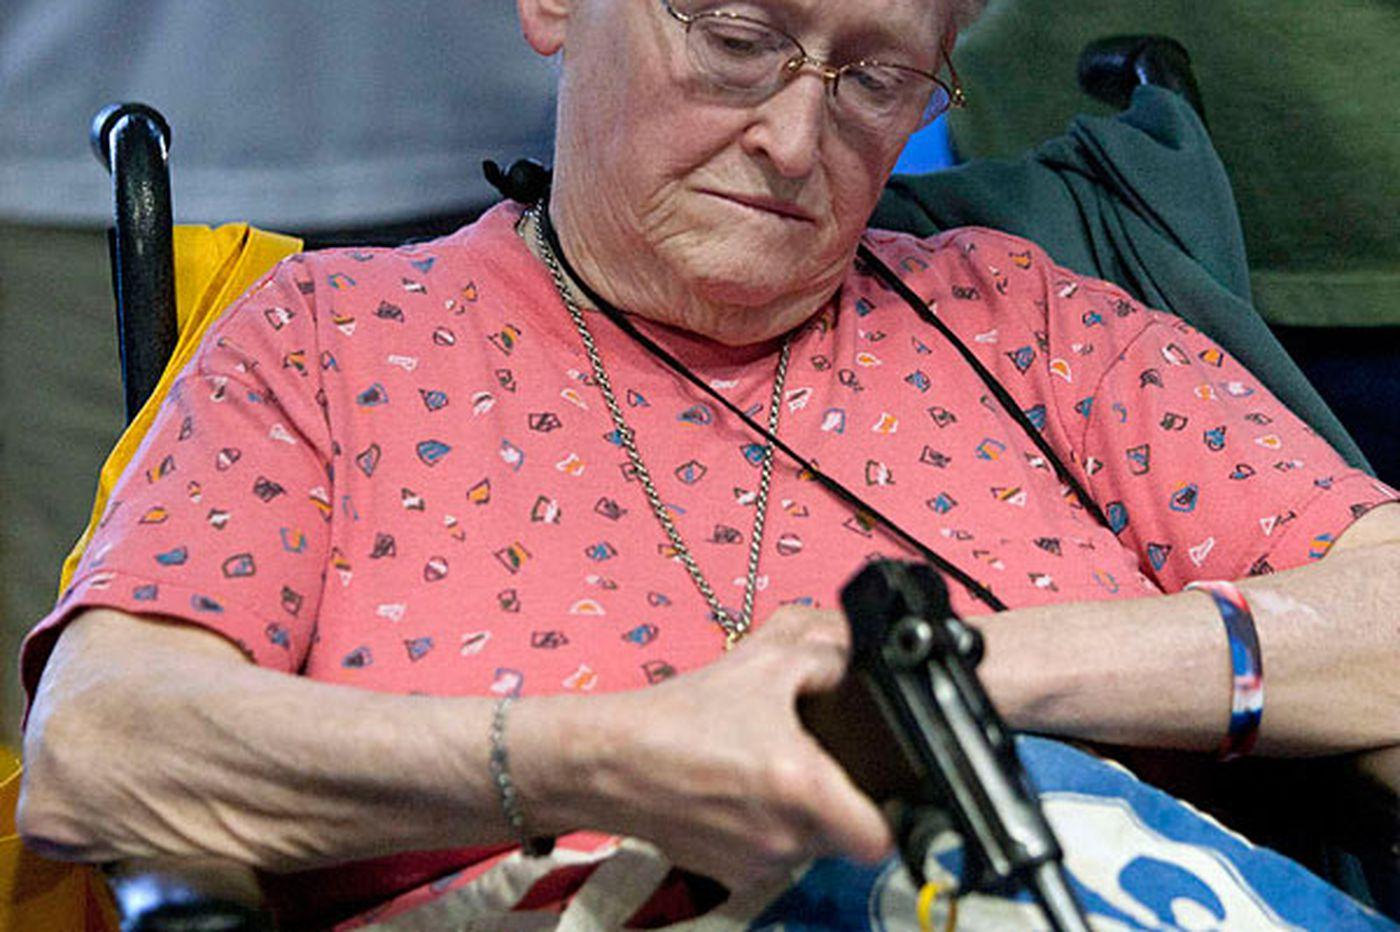 NRA leaders warn of gun-control fight